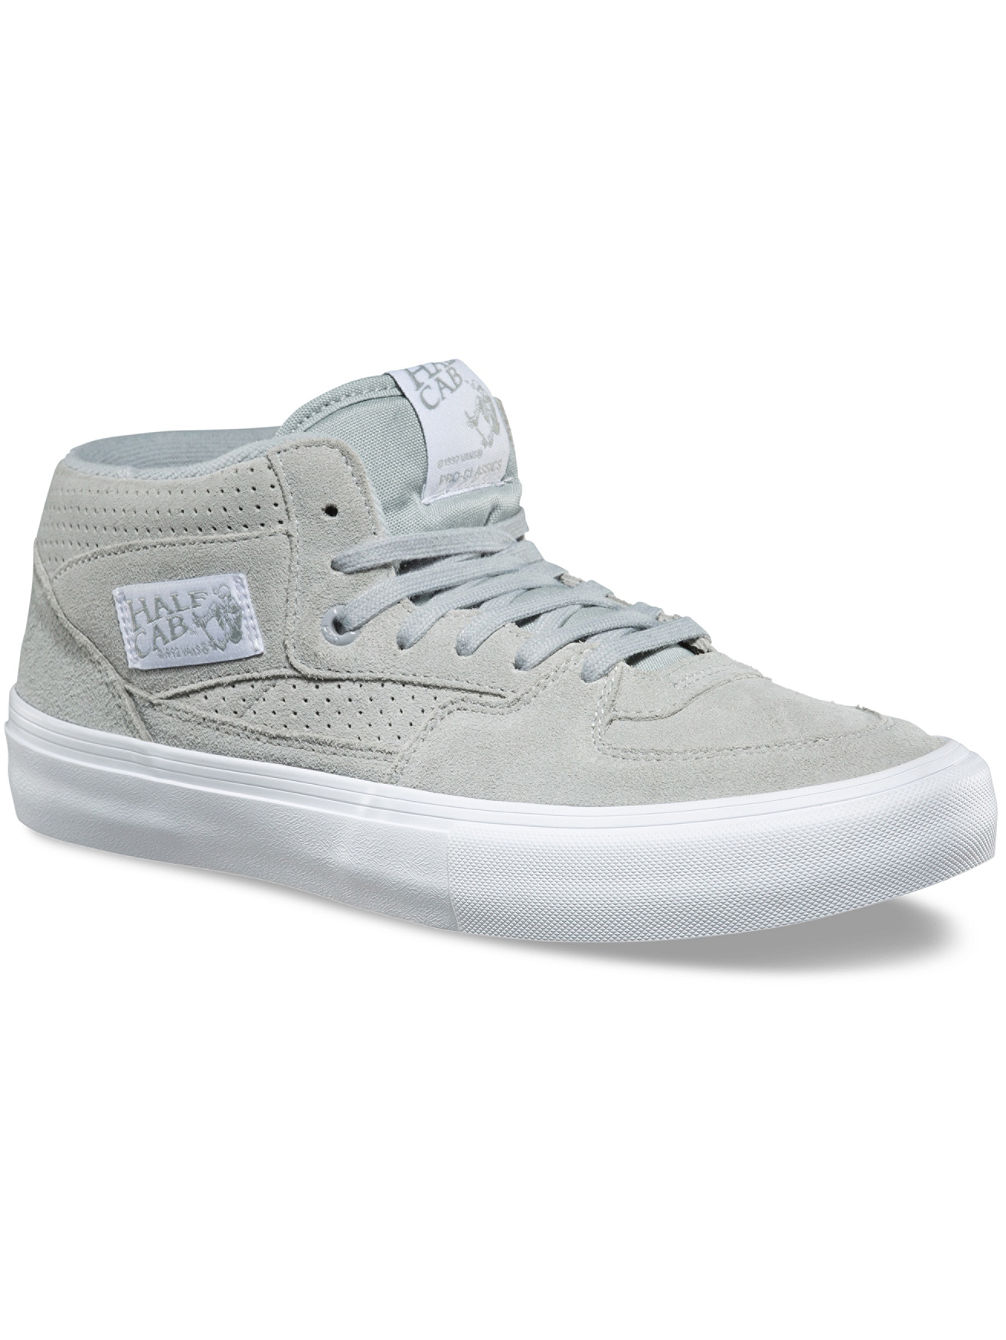 55515fe5a0 Buy Vans Half Cab Pro Skate Shoes online at Blue Tomato